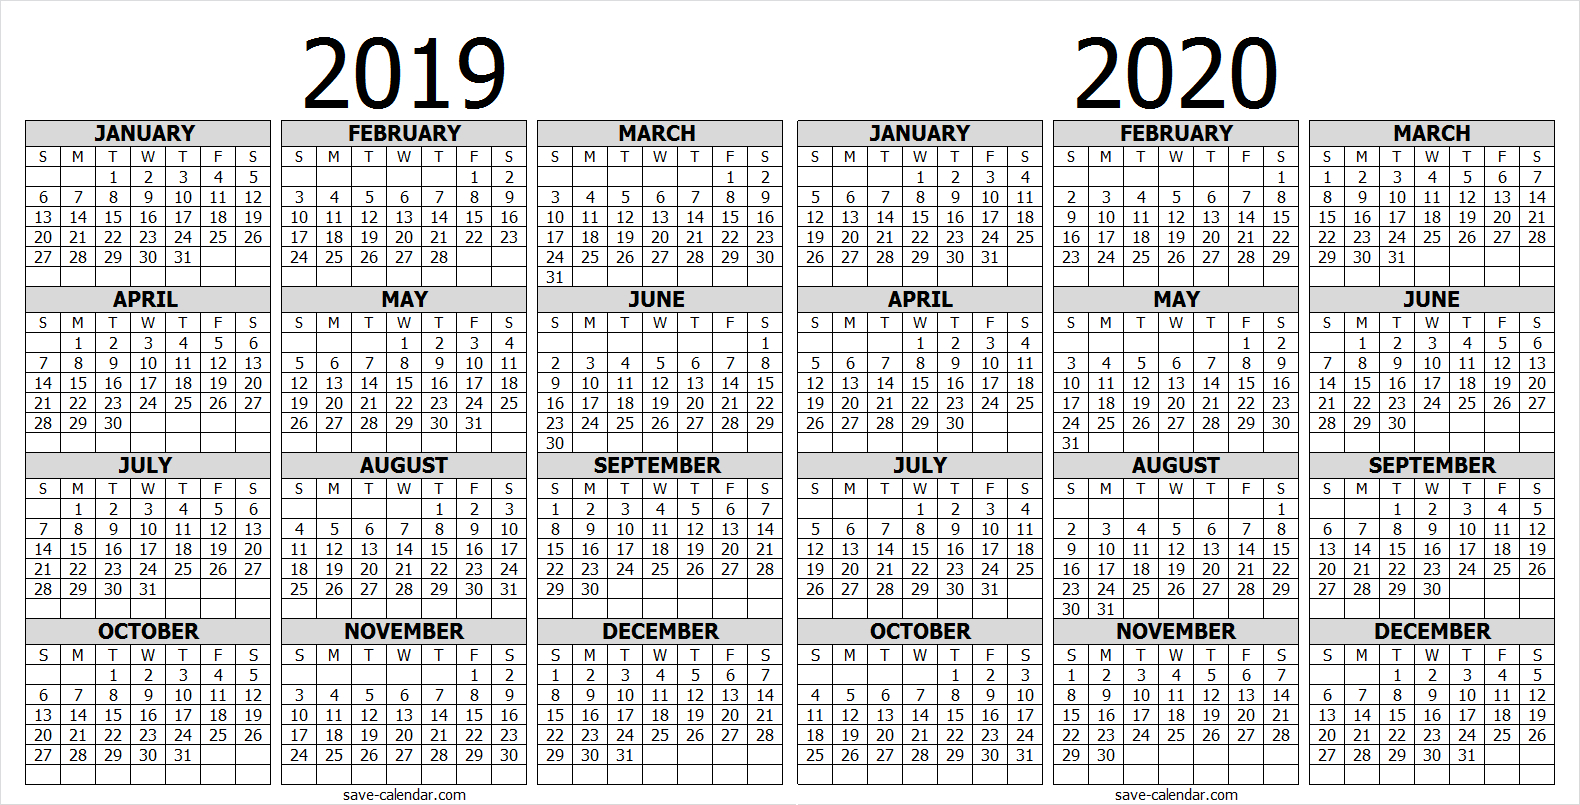 Calendar 2019 2020 One Page | 2019 Calendar | Free Calendar inside Year To A Page 2019/2020 Calender